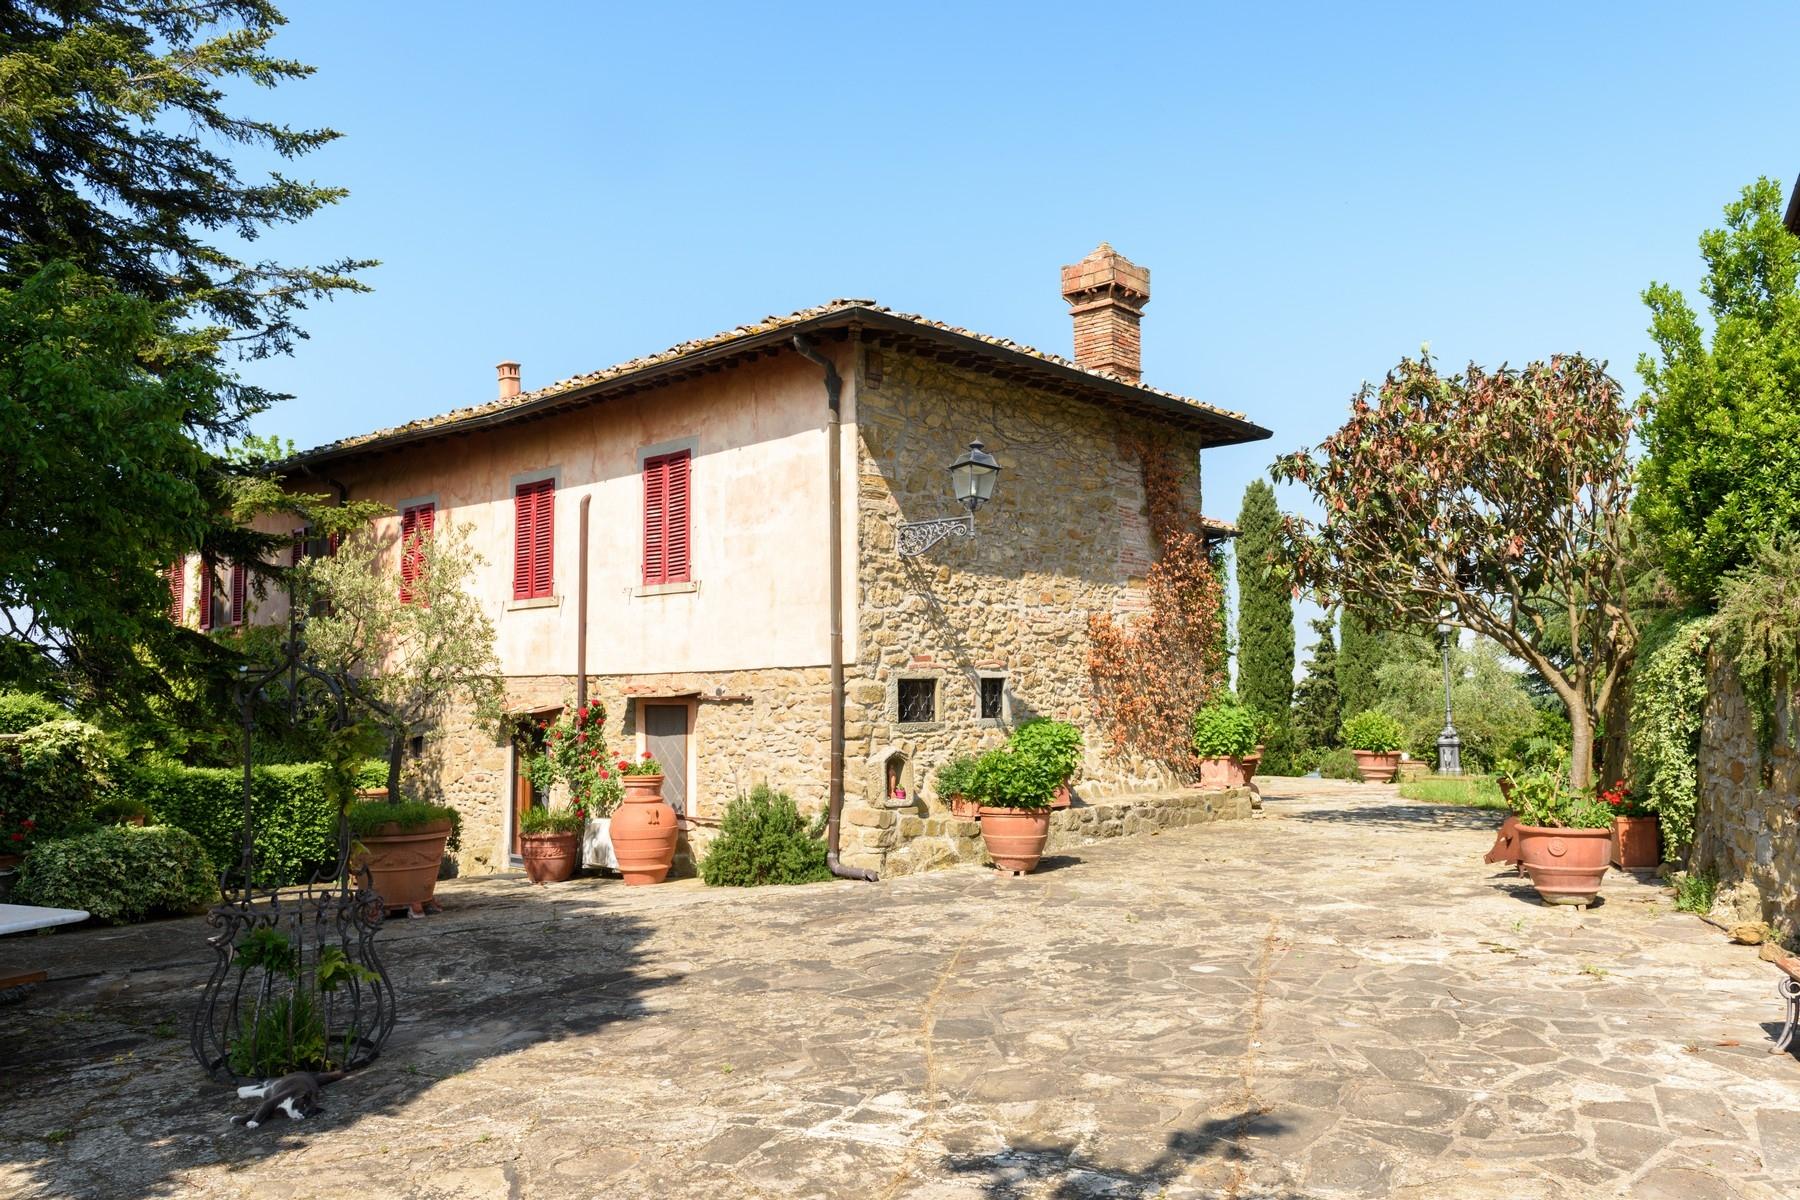 Villa in Vendita a Greve In Chianti: 5 locali, 491 mq - Foto 28